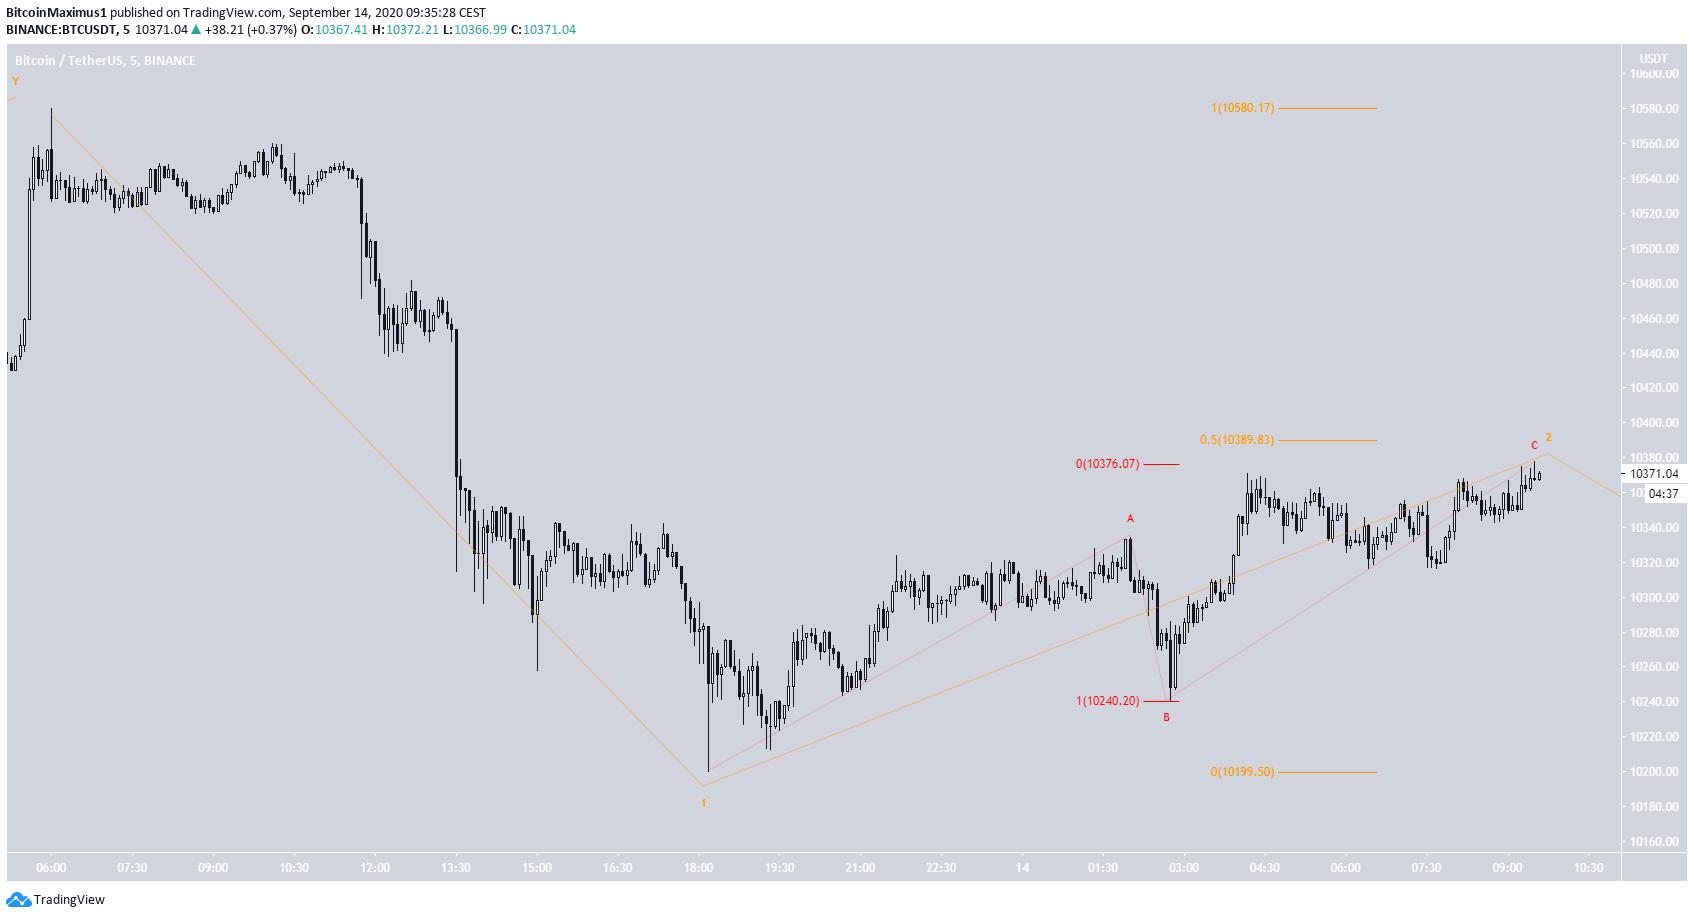 Bitcoin's Short-Term Count